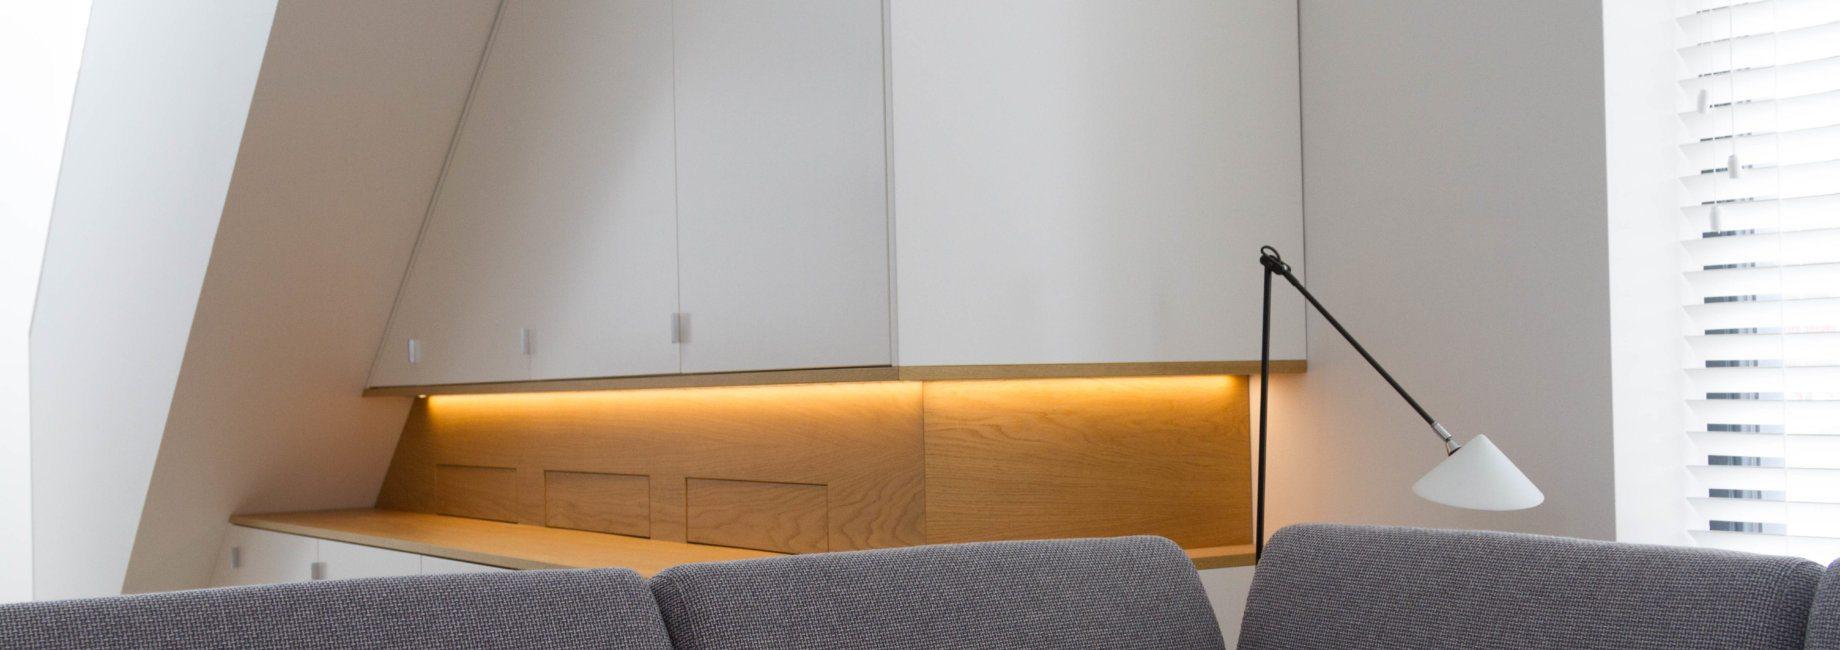 Woonkamer Kast Onder Schuin Plafond Kroon Interieurbouw